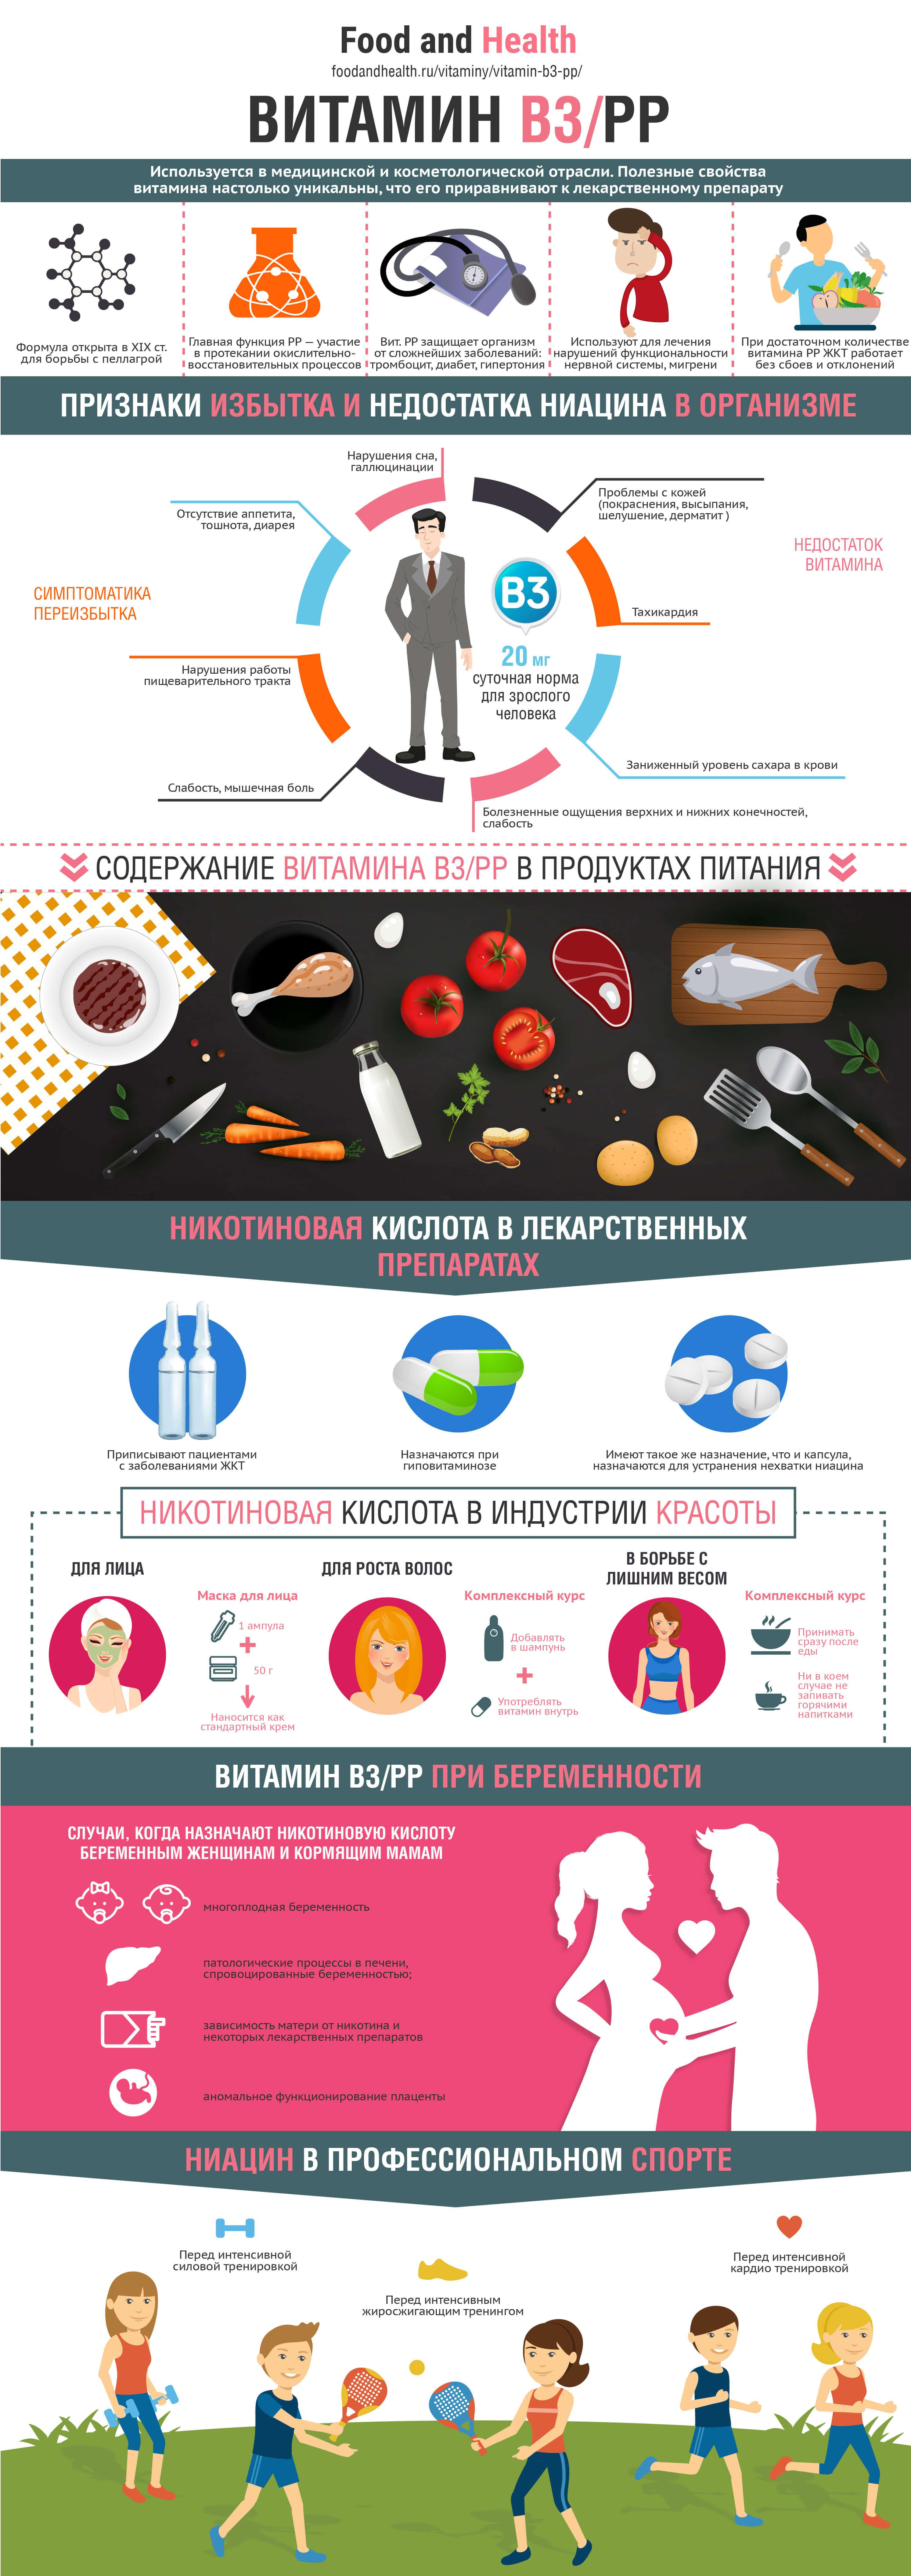 Витамин B3: инфографика